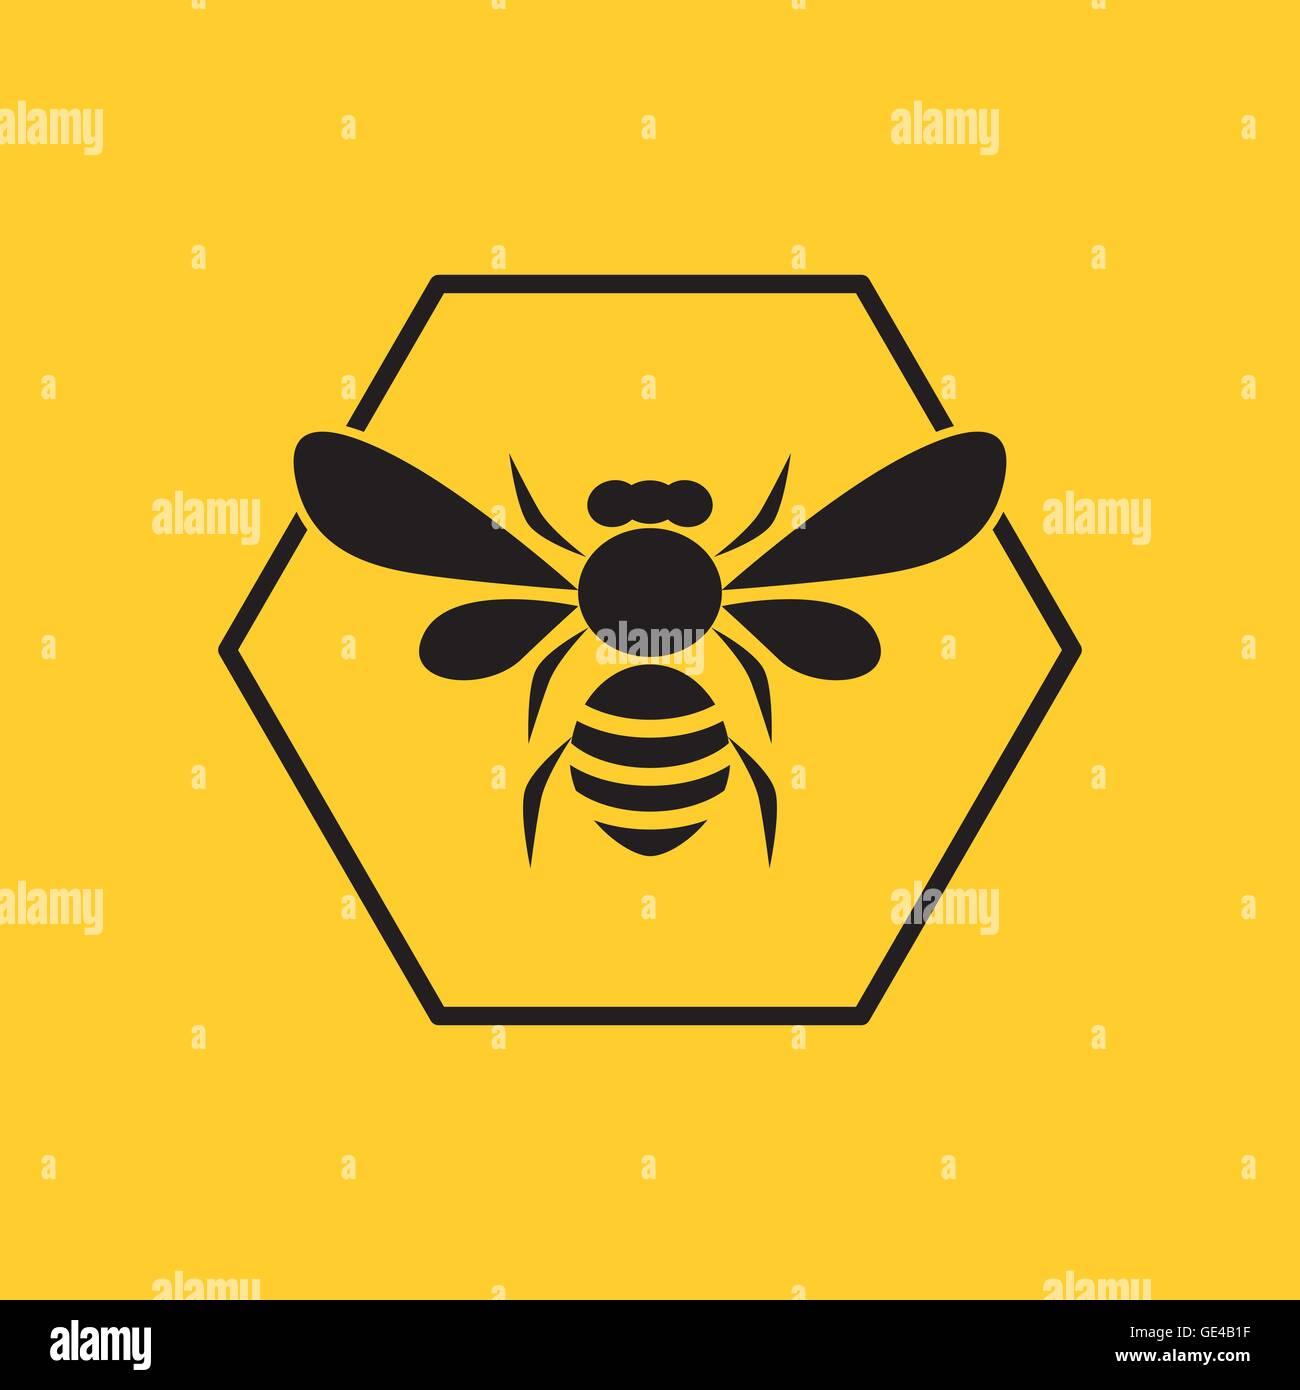 Bee logo stock vector art illustration vector image 111963867 bee logo bee logo stock vector biocorpaavc